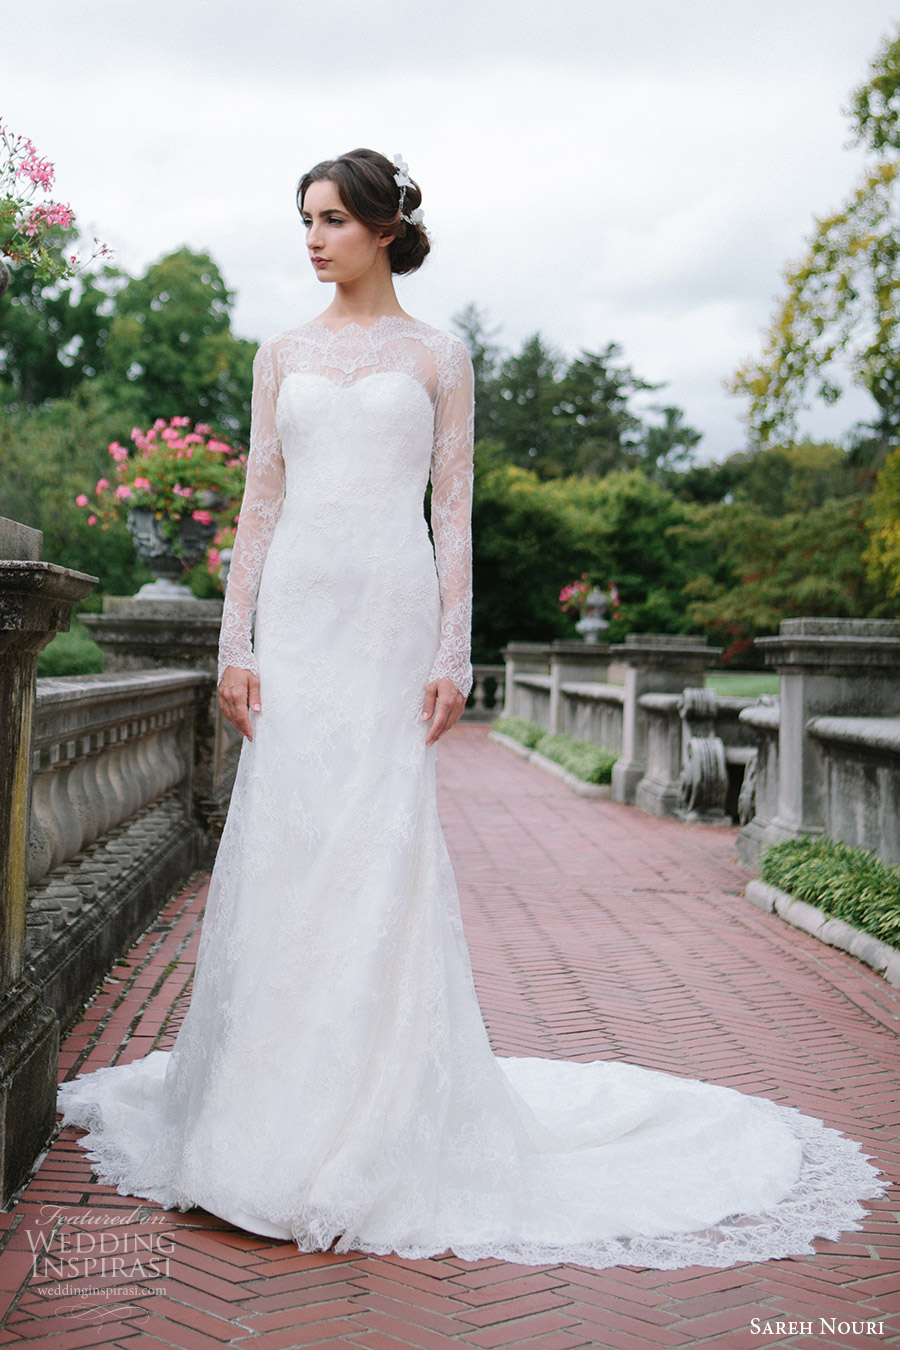 sareh nouri bridal fall 2016 long sleeves sweetheart illusion jewel neck lace wedding dress (miriam) fv train elegant romantic